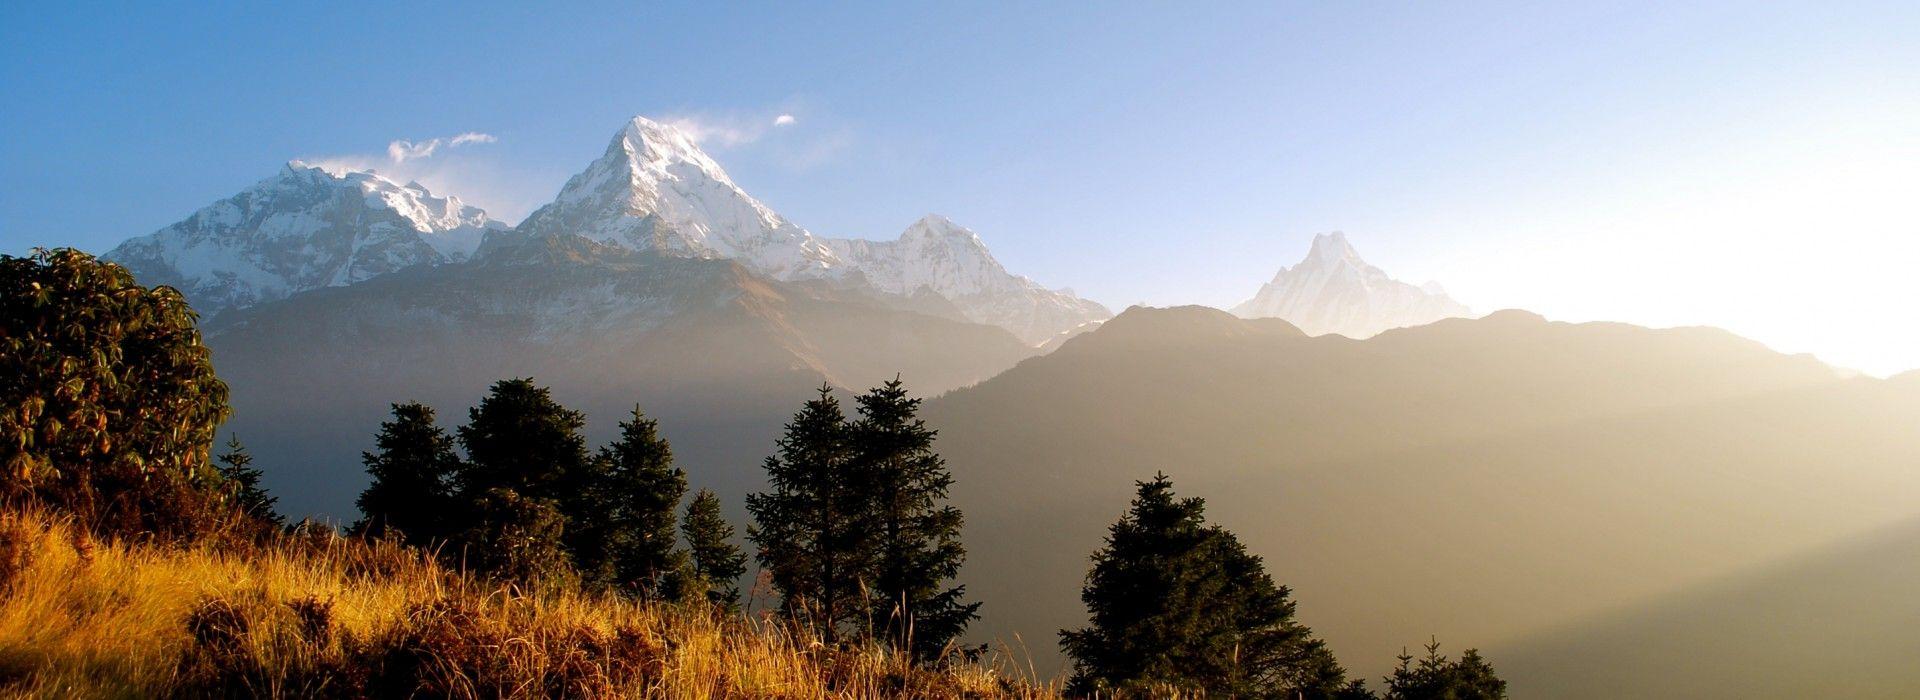 Mountains Tours in Annapurna Circuit trek